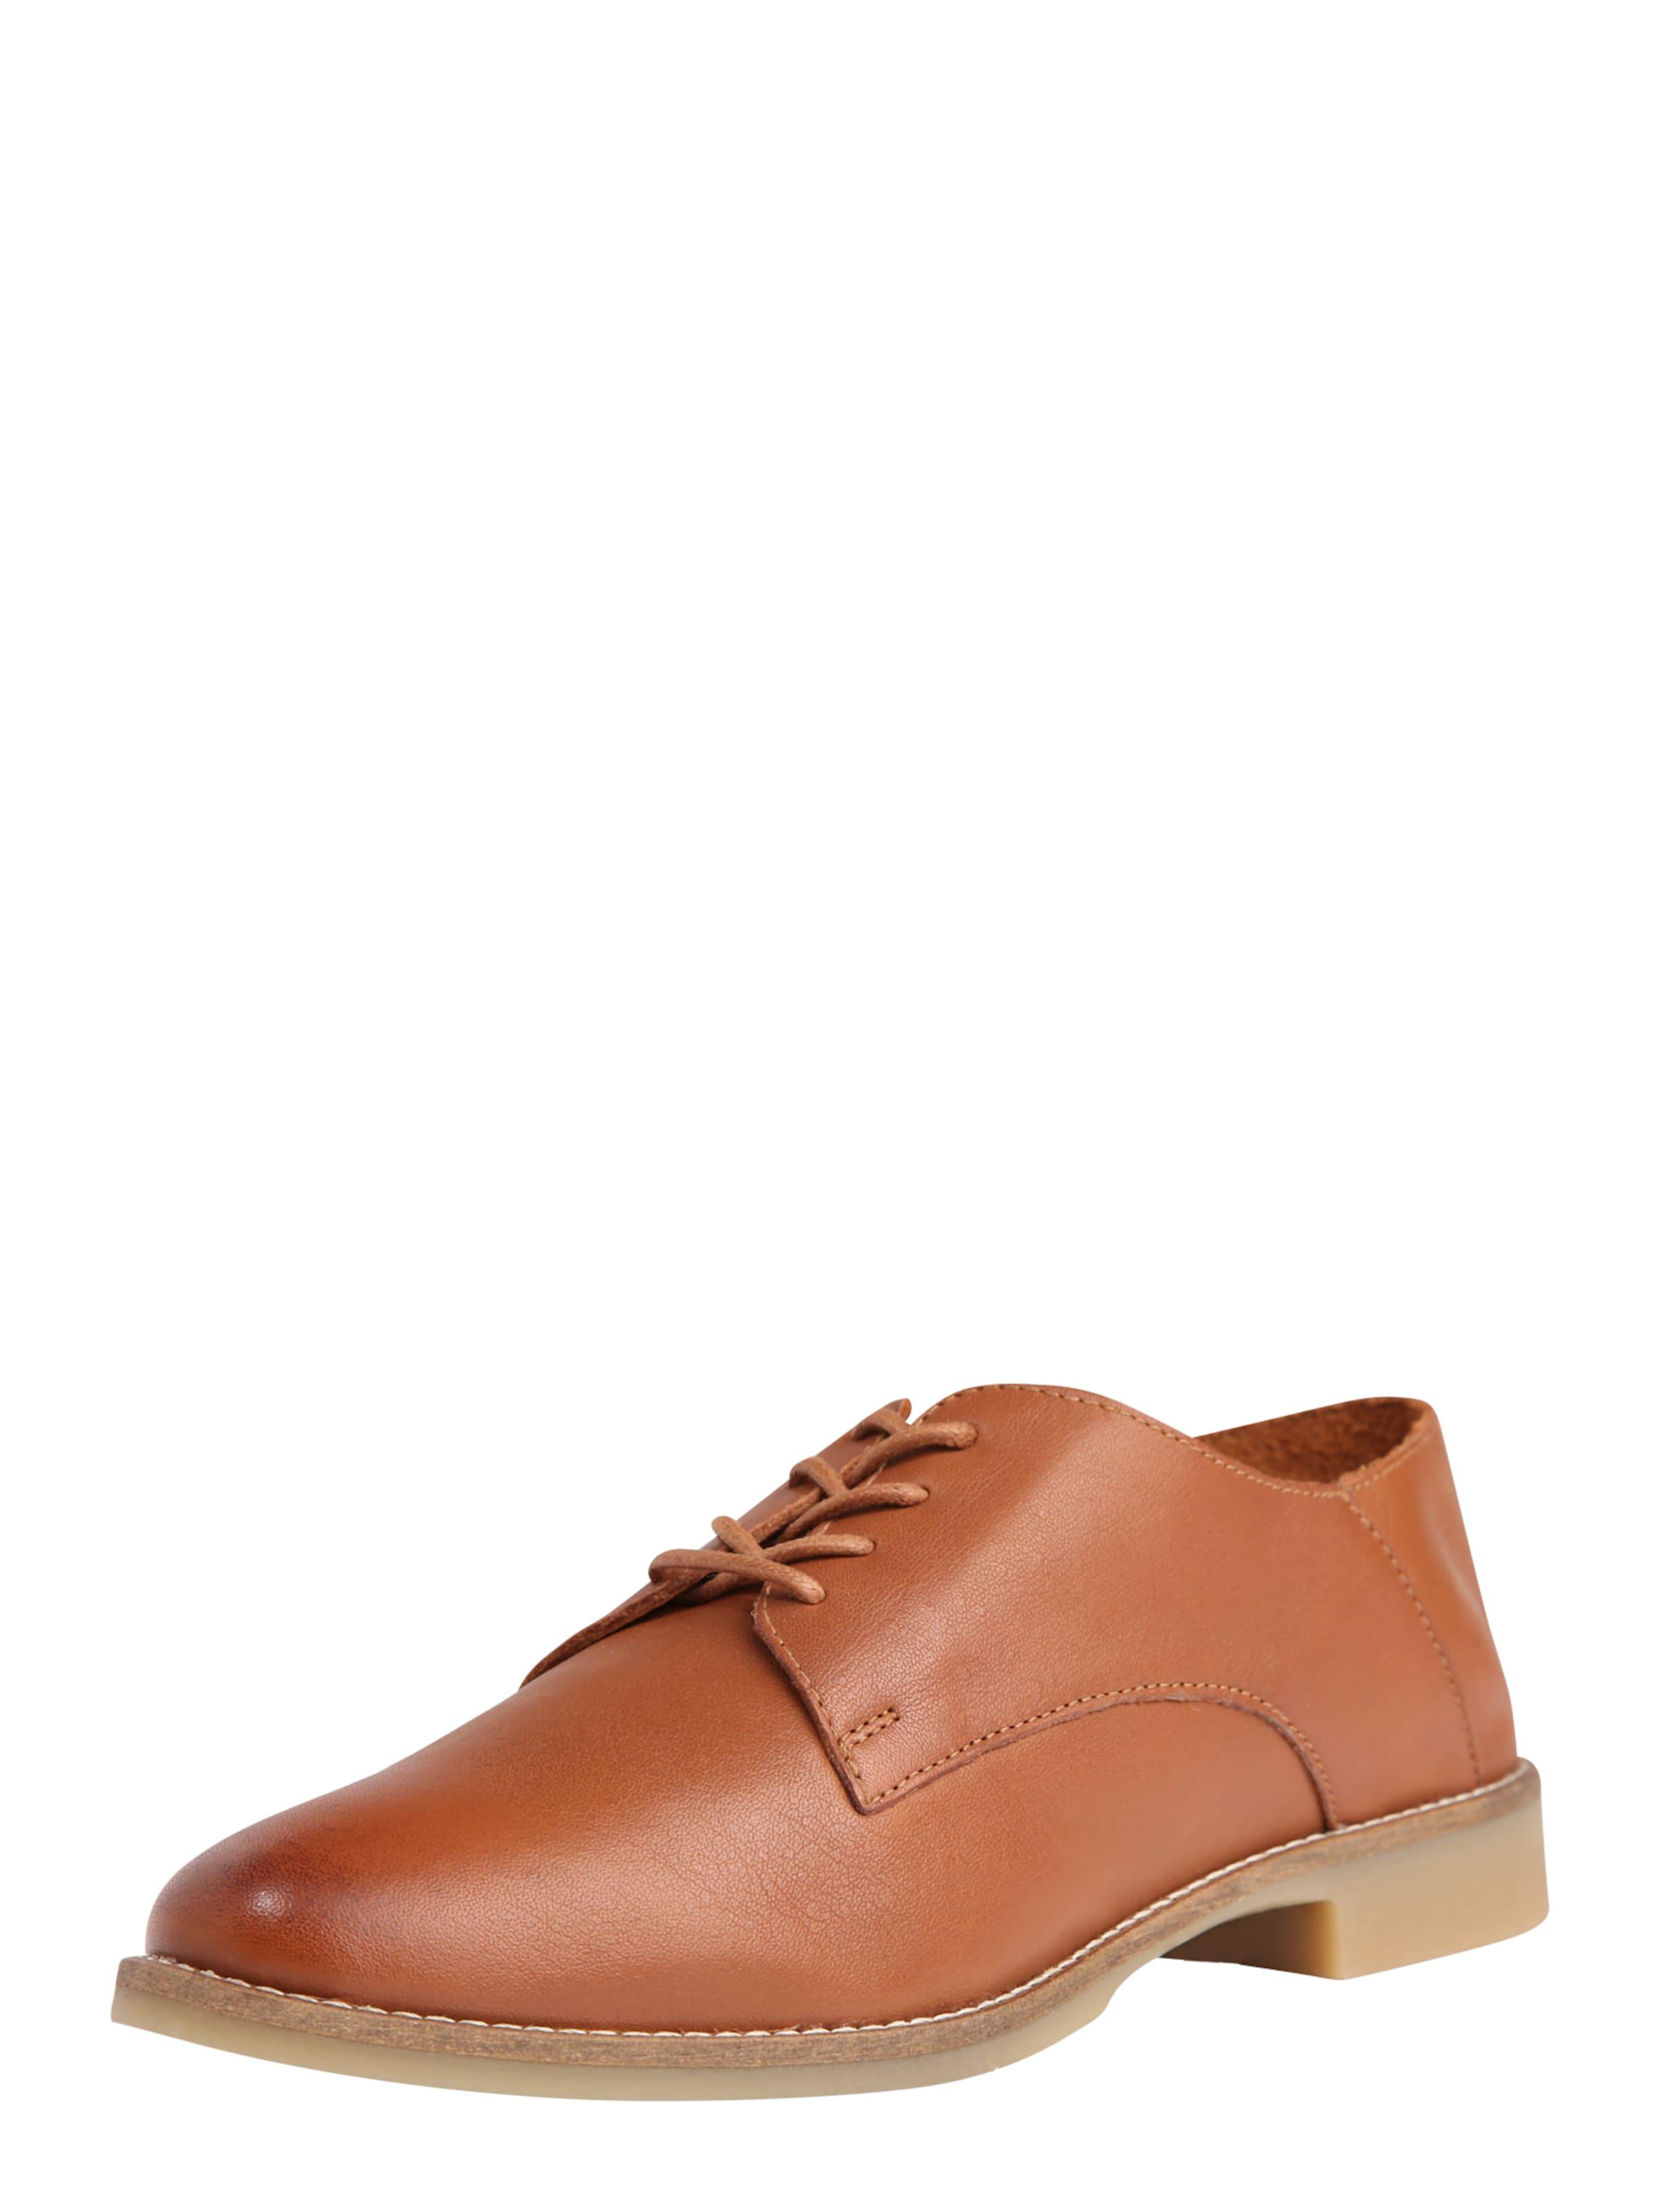 ALDO Halbschuh TEPOLINI Verschleißfeste billige Schuhe